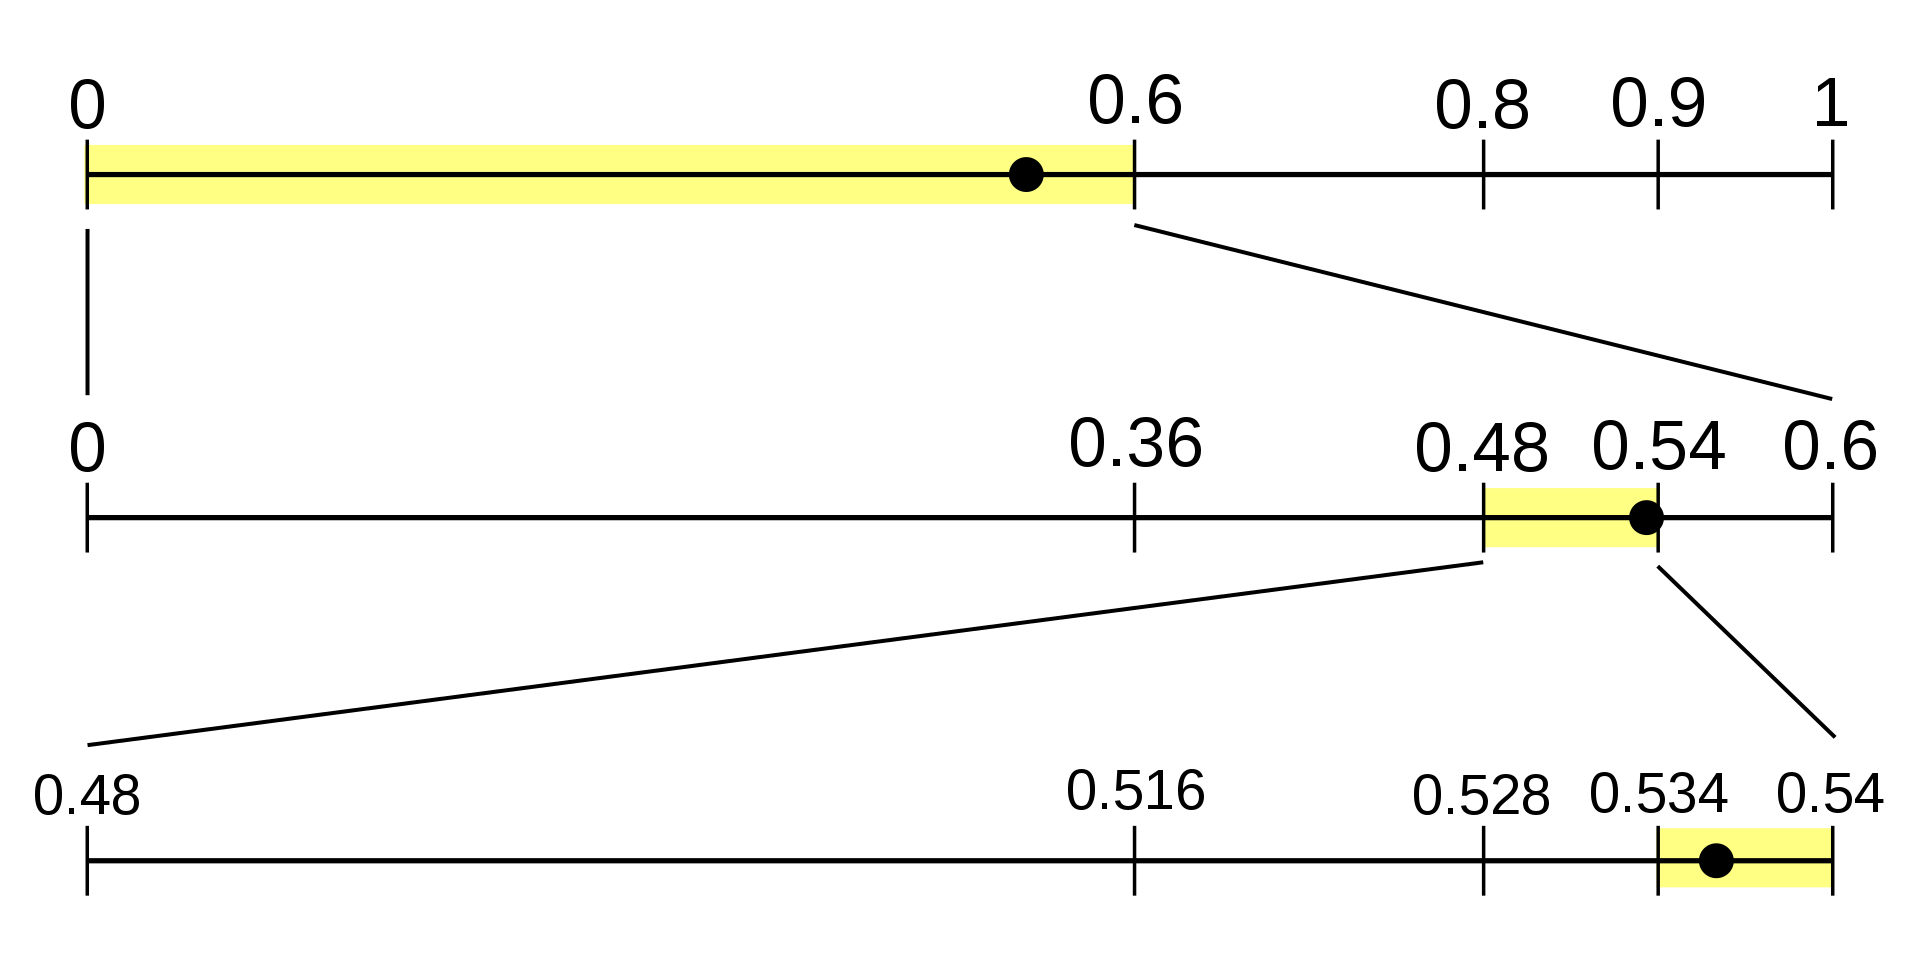 Arithmetic_encoding.svg